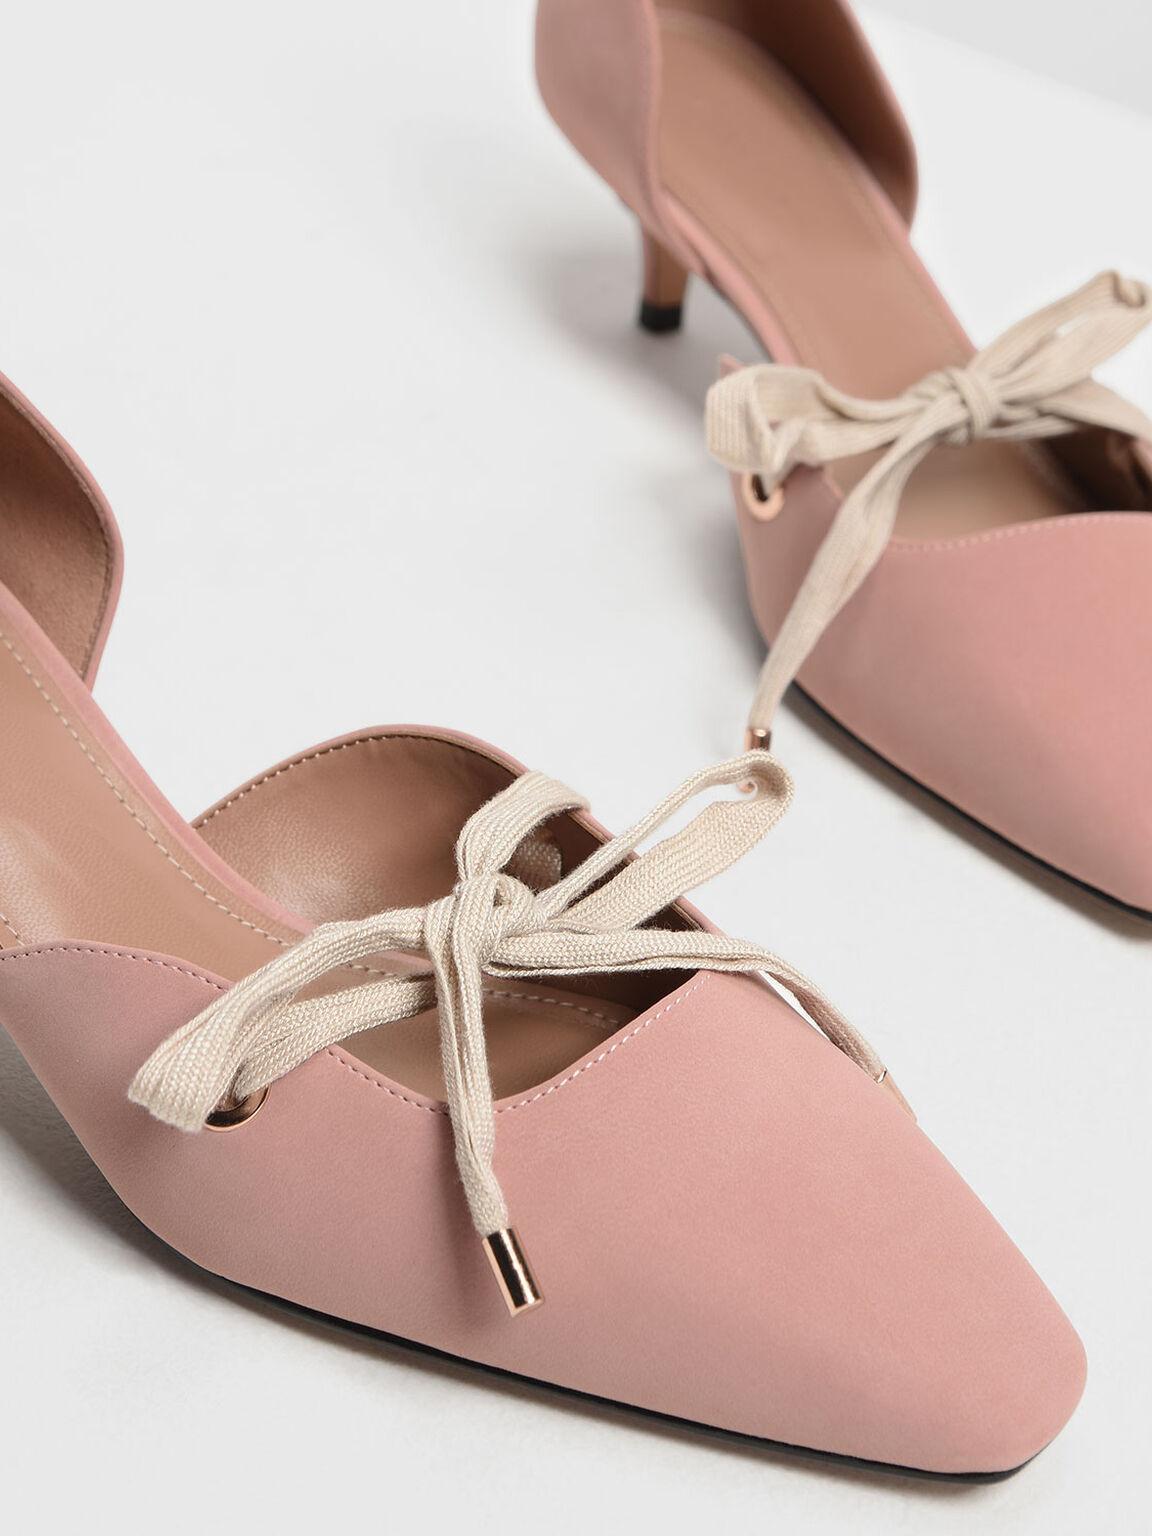 Bow Detail D'Orsay Kitten Heels, Blush, hi-res